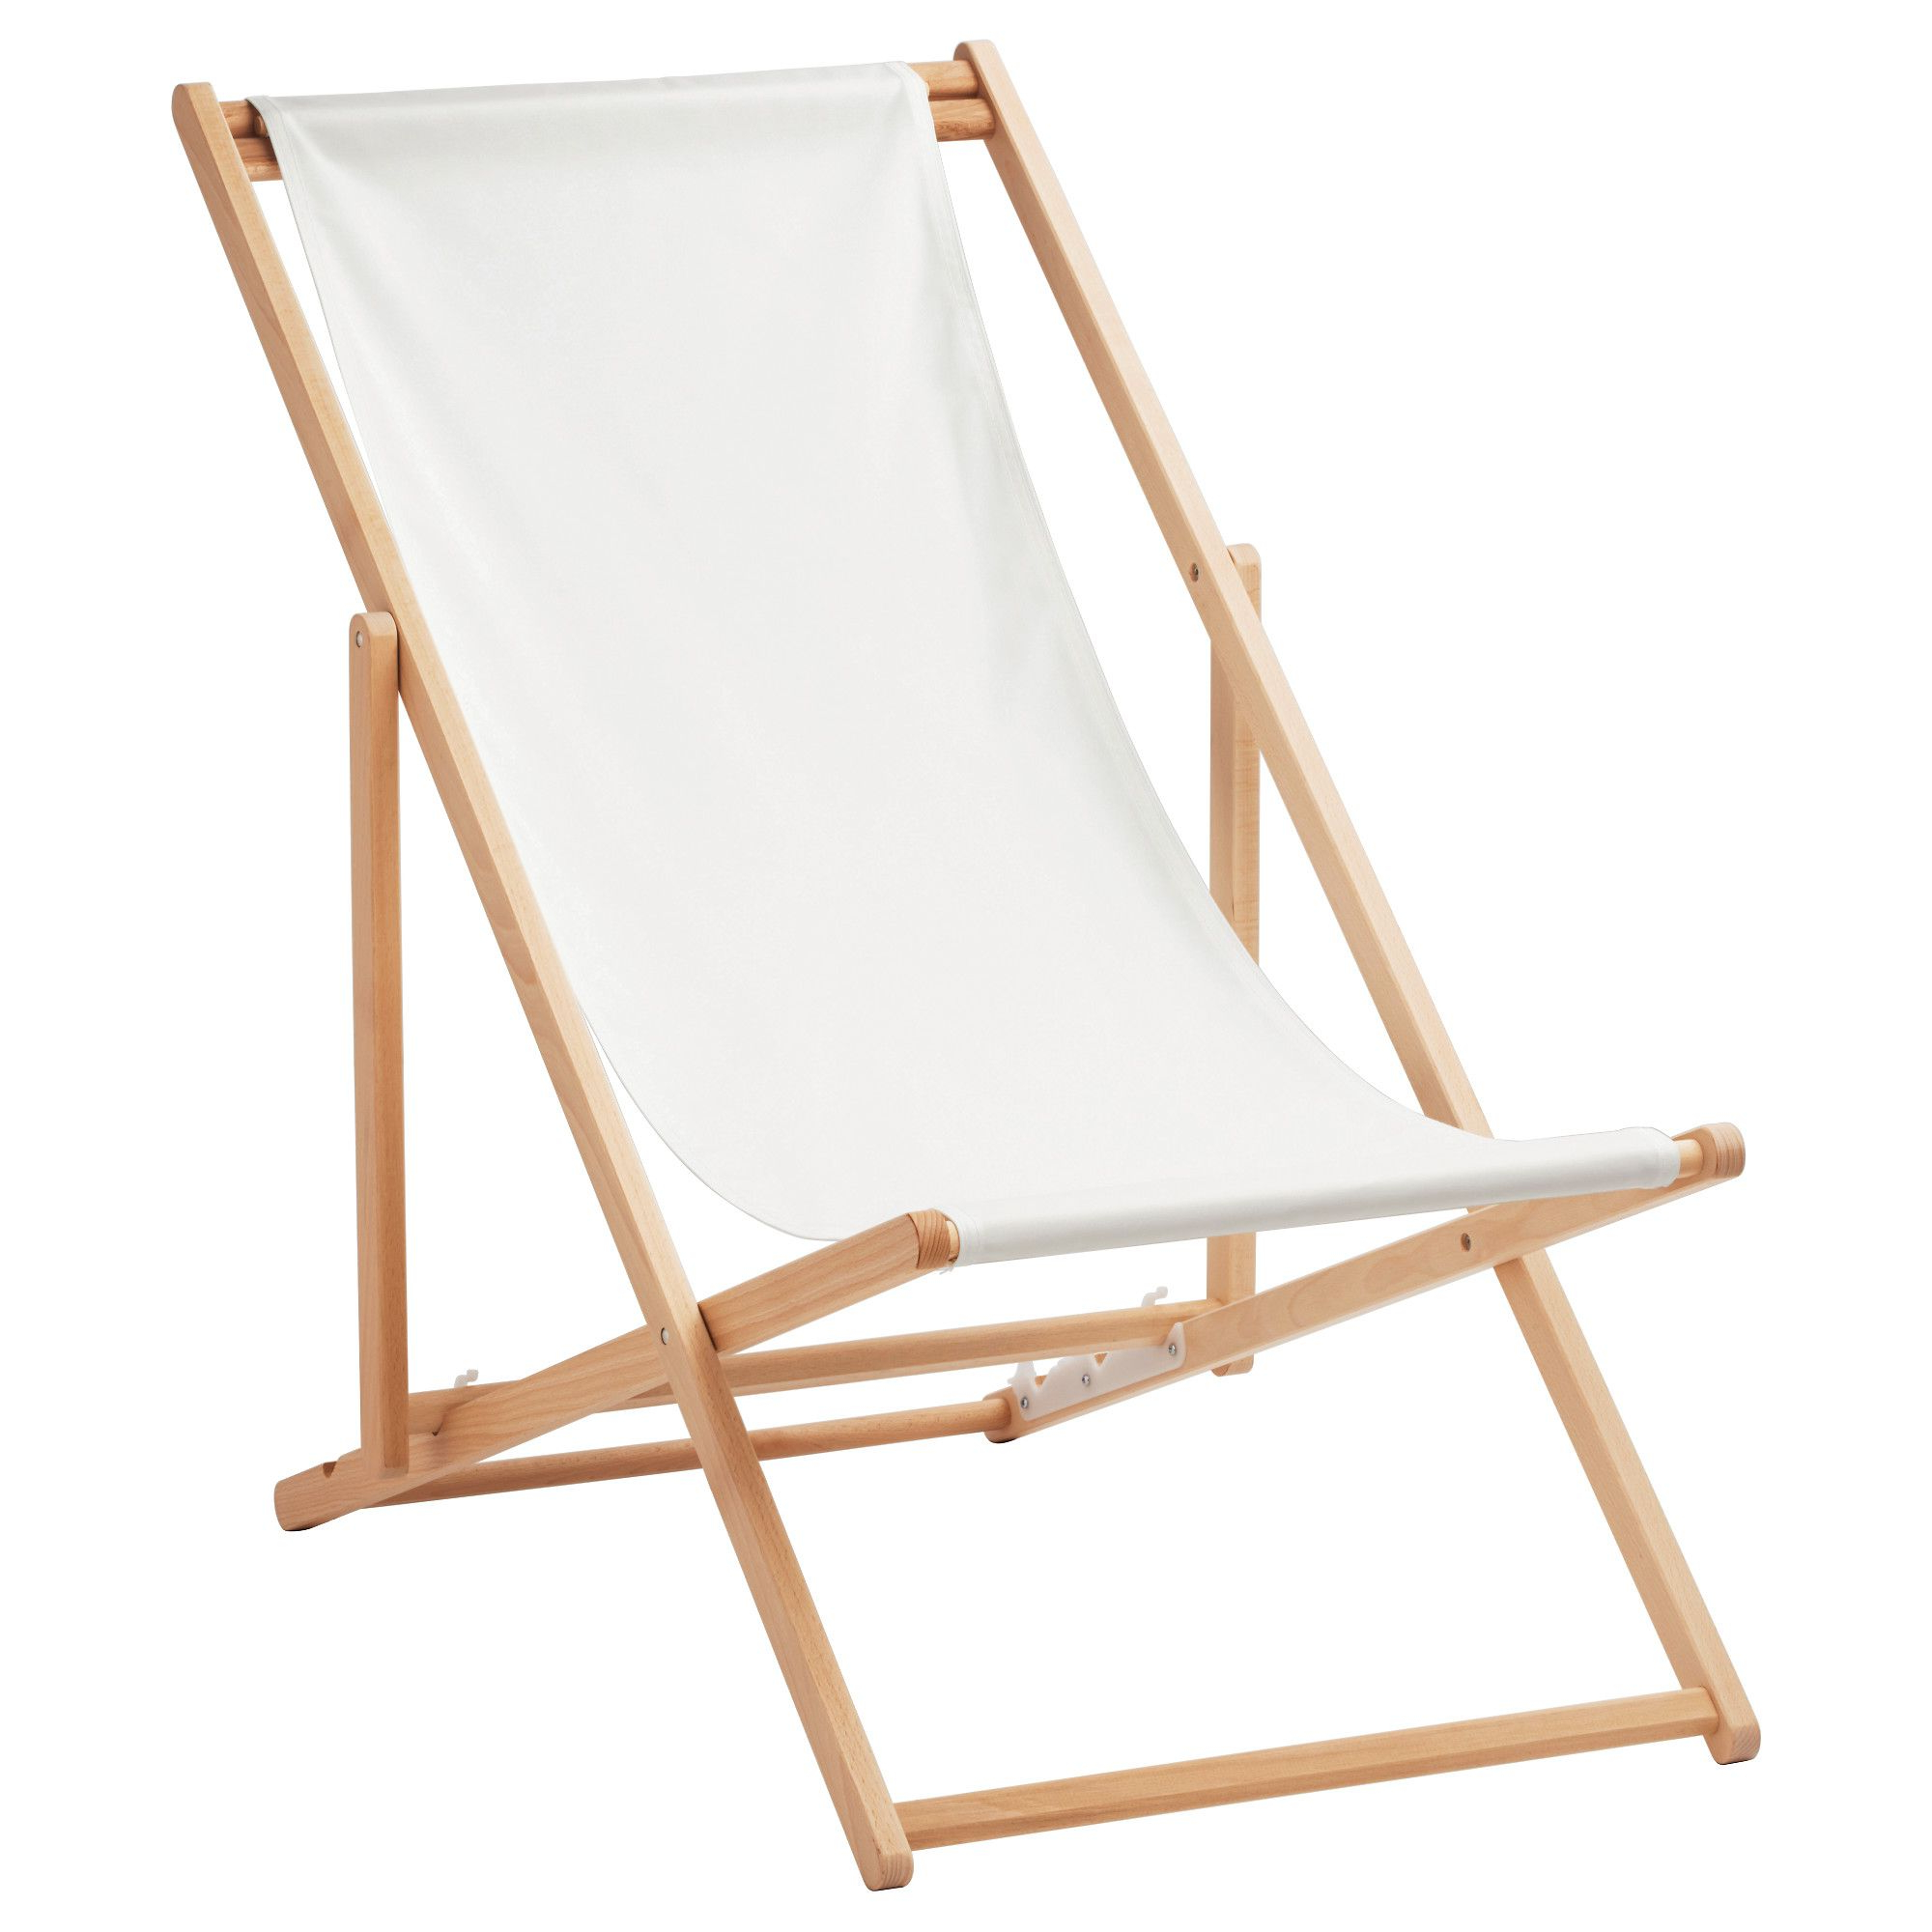 Sillas Playa Ikea U3dh Mysingsà Silla De Playa Plegable Blanco Ikea Backyard En